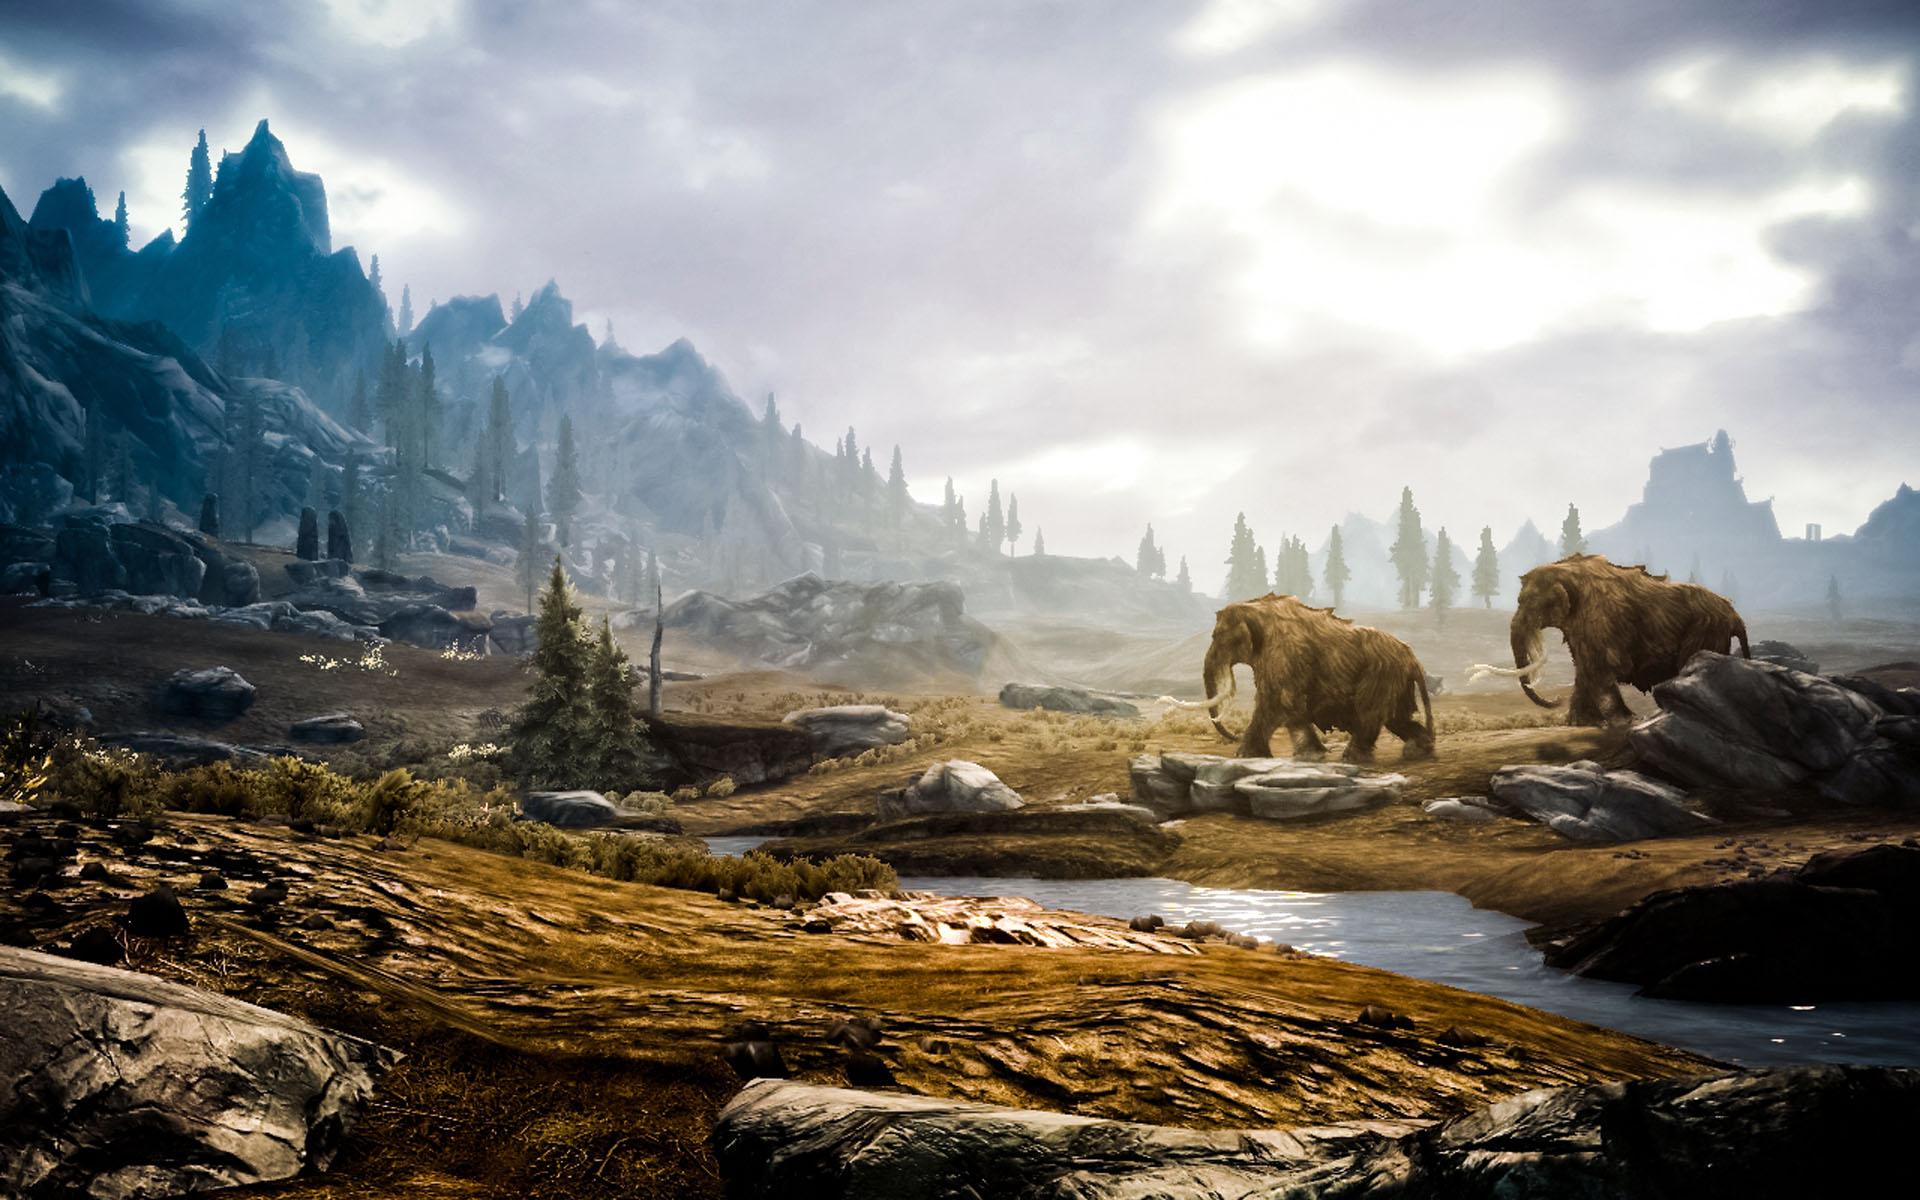 The Elder Scrolls V: Skyrim PC Game Review | Let's Rock Reviews